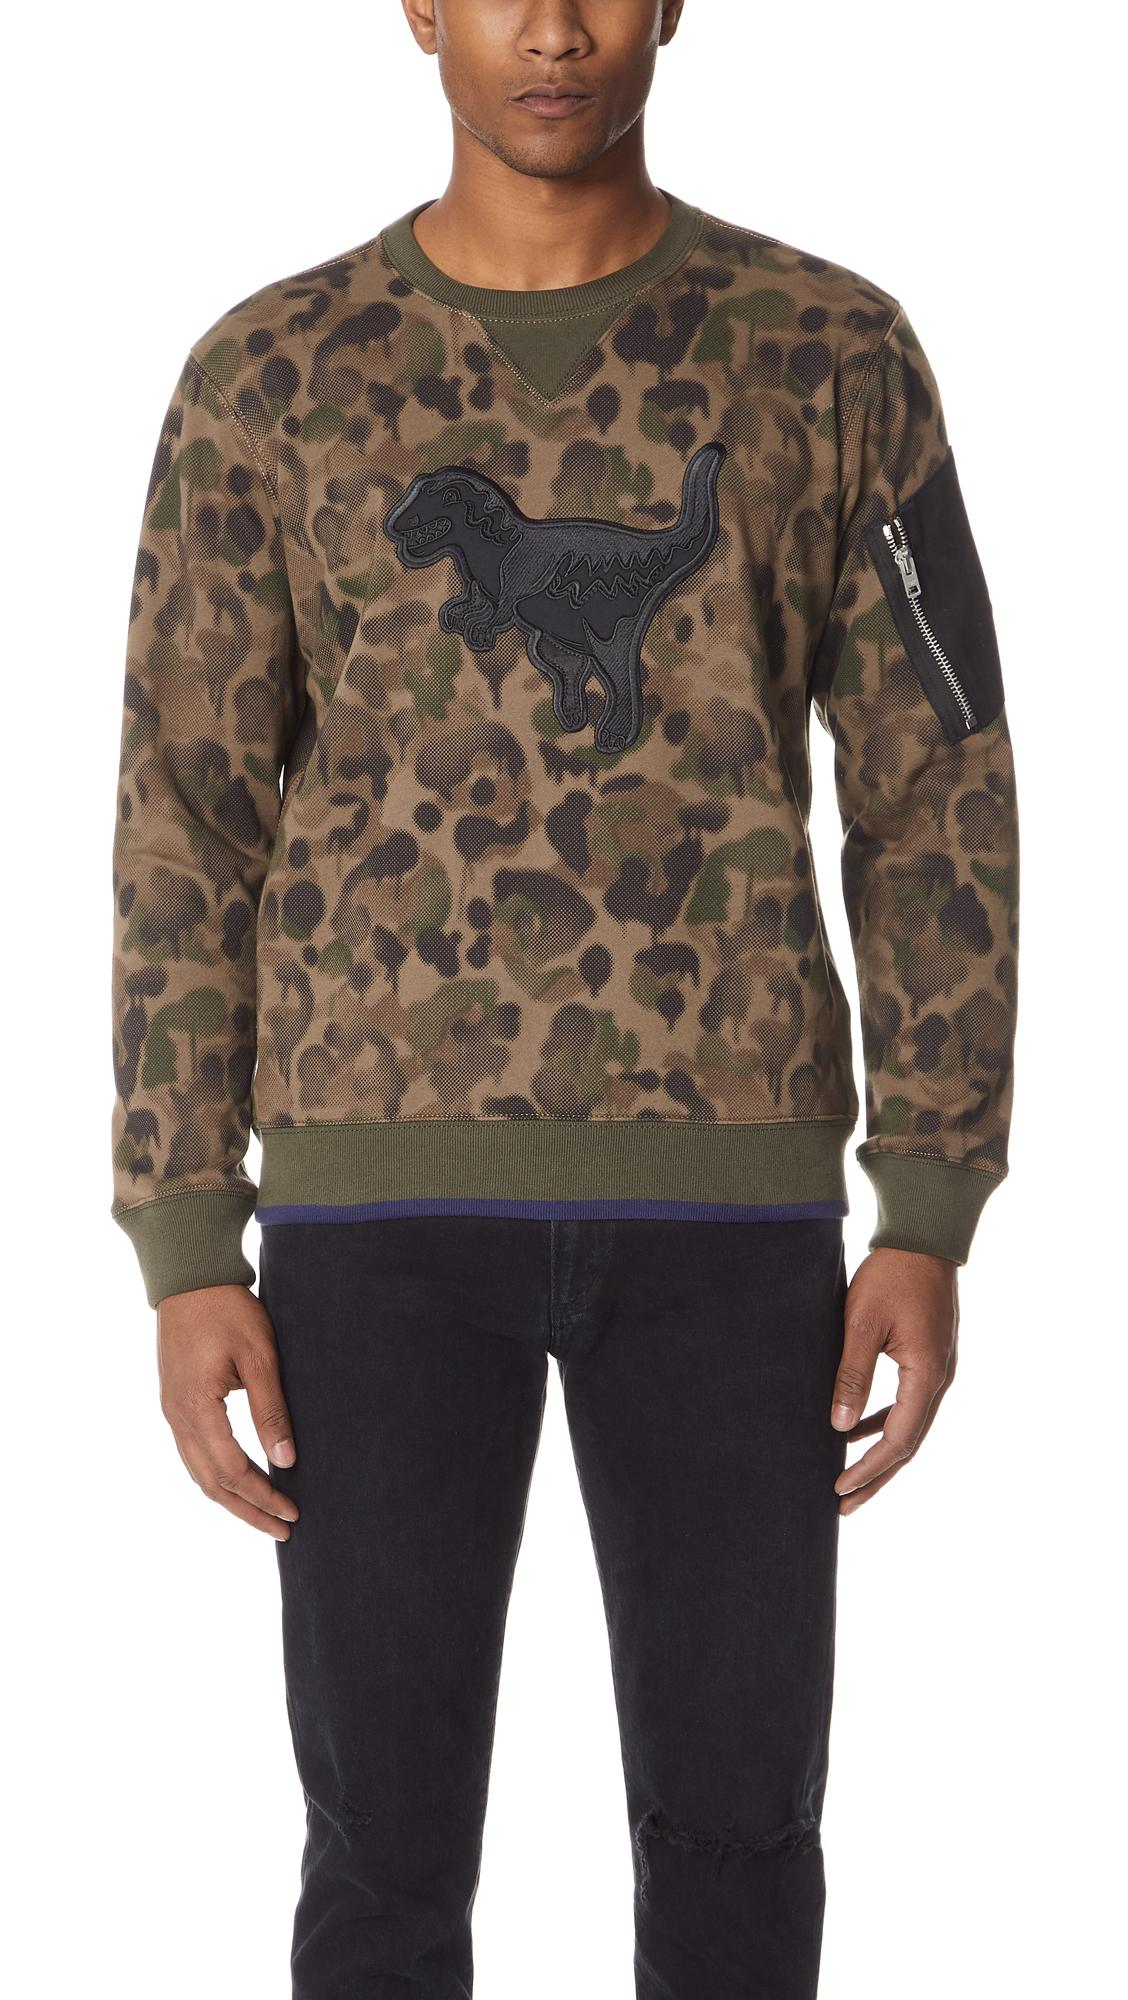 Coach 1941 Wild Beast Rexy Sweatshirt In Camo